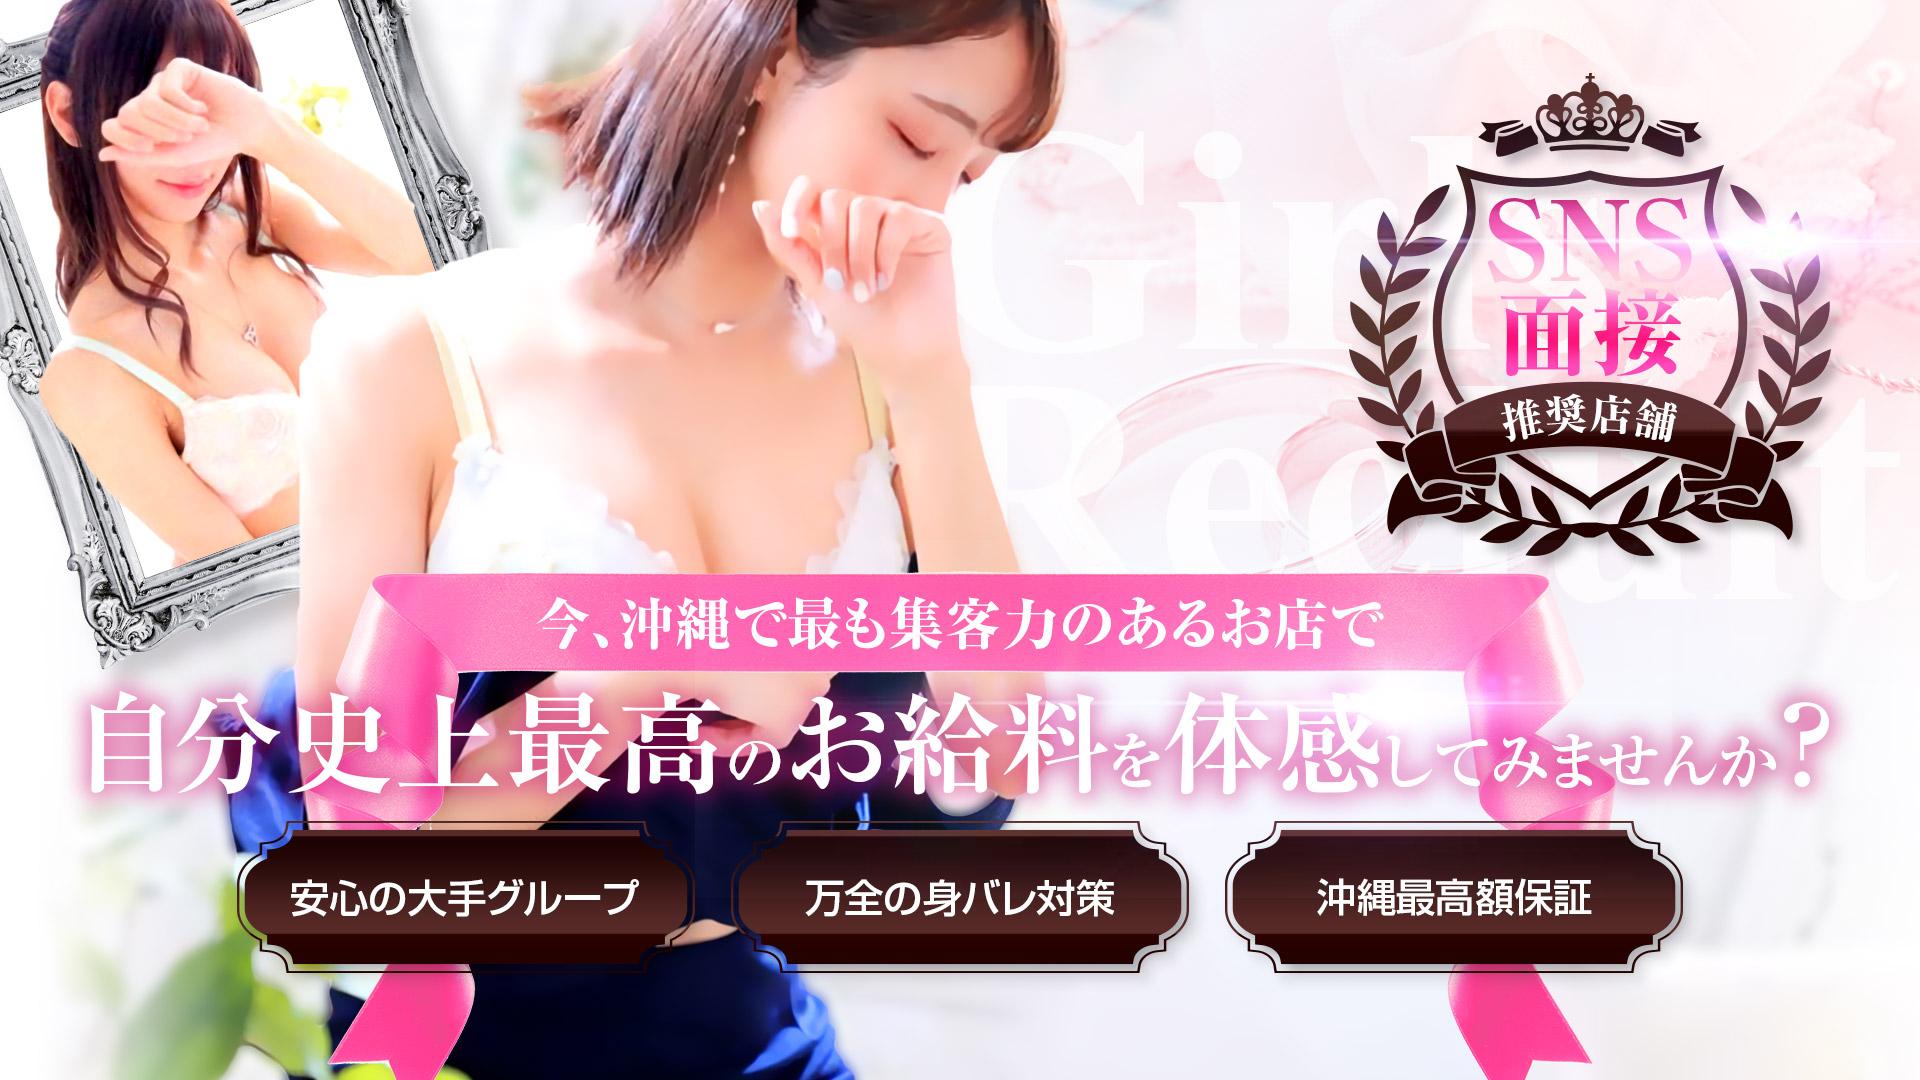 E-girls沖縄の求人画像